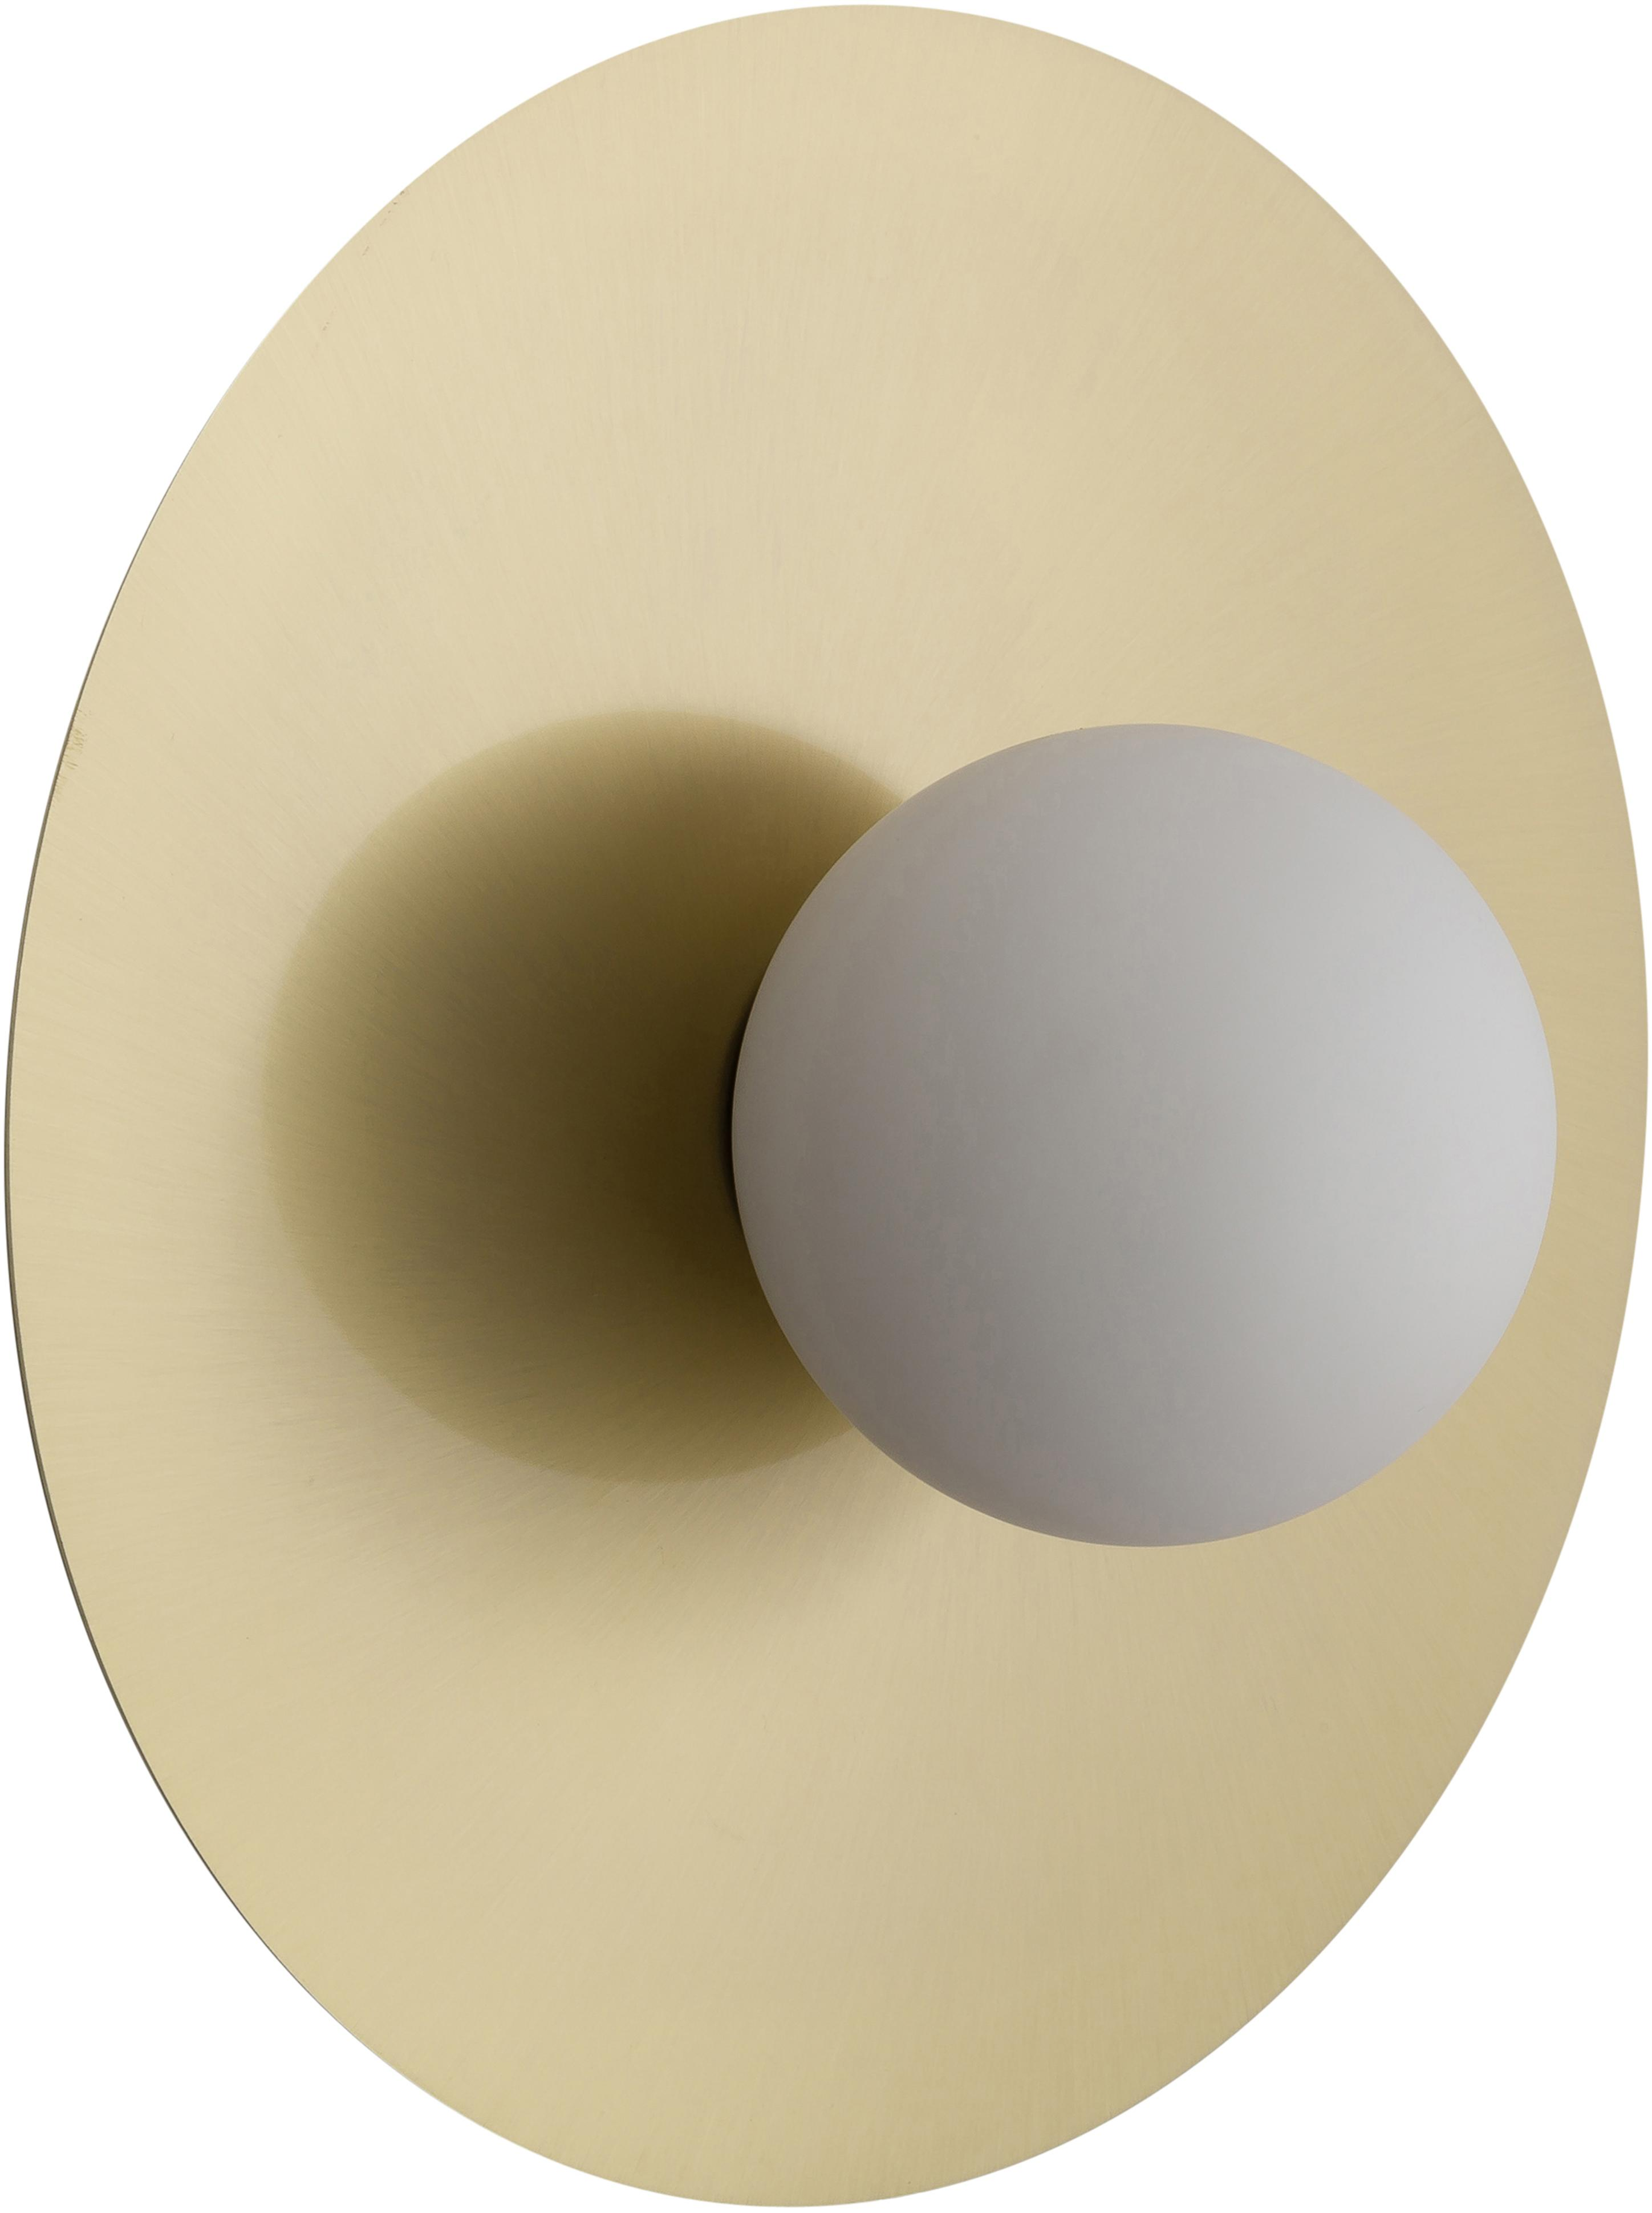 Aplique LED Starling, Pantalla: vidrio, Anclaje: latón, mate Pantalla: blanco, Ø 33 cm